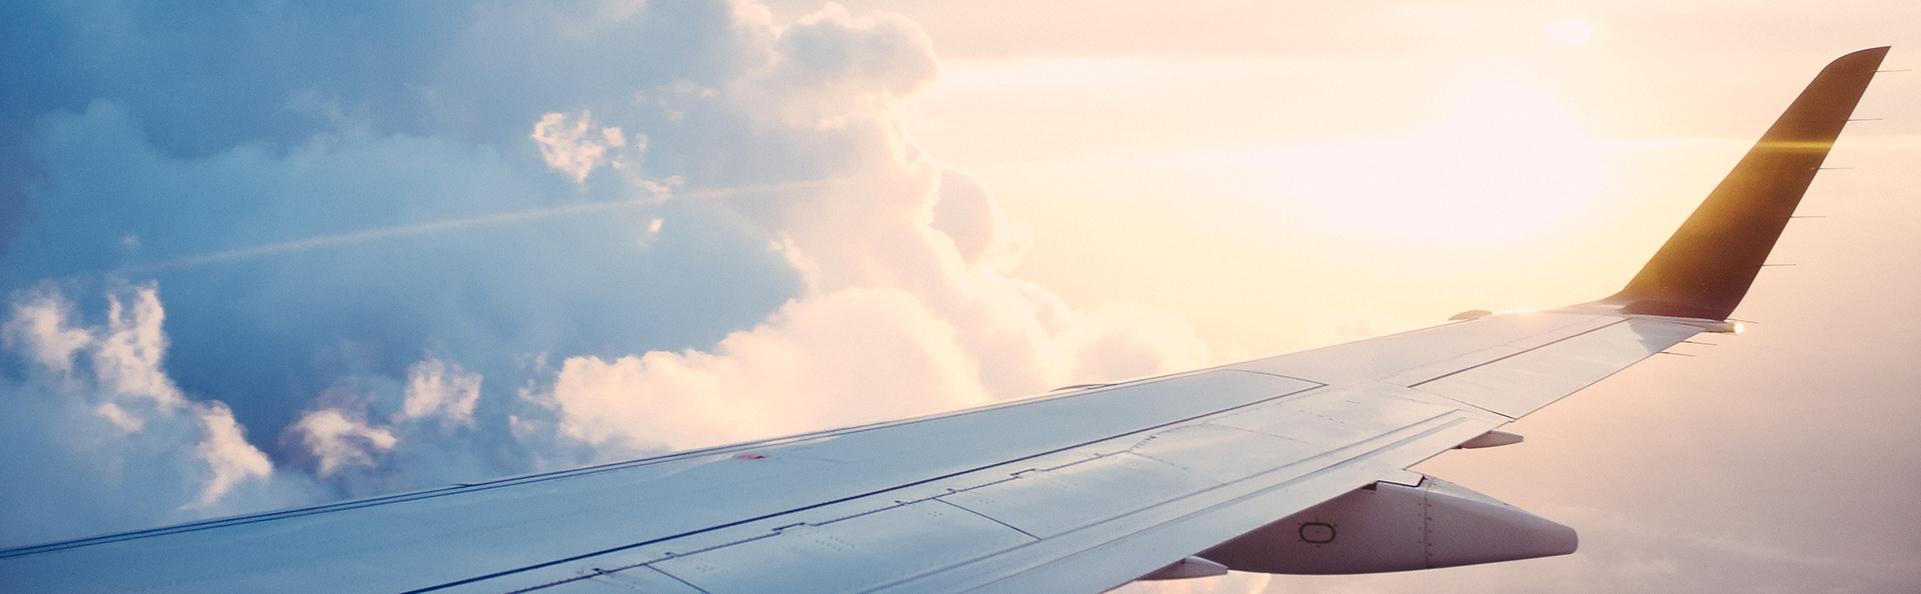 Flexed International Citizen Driving Aeroplane Wing Cropped